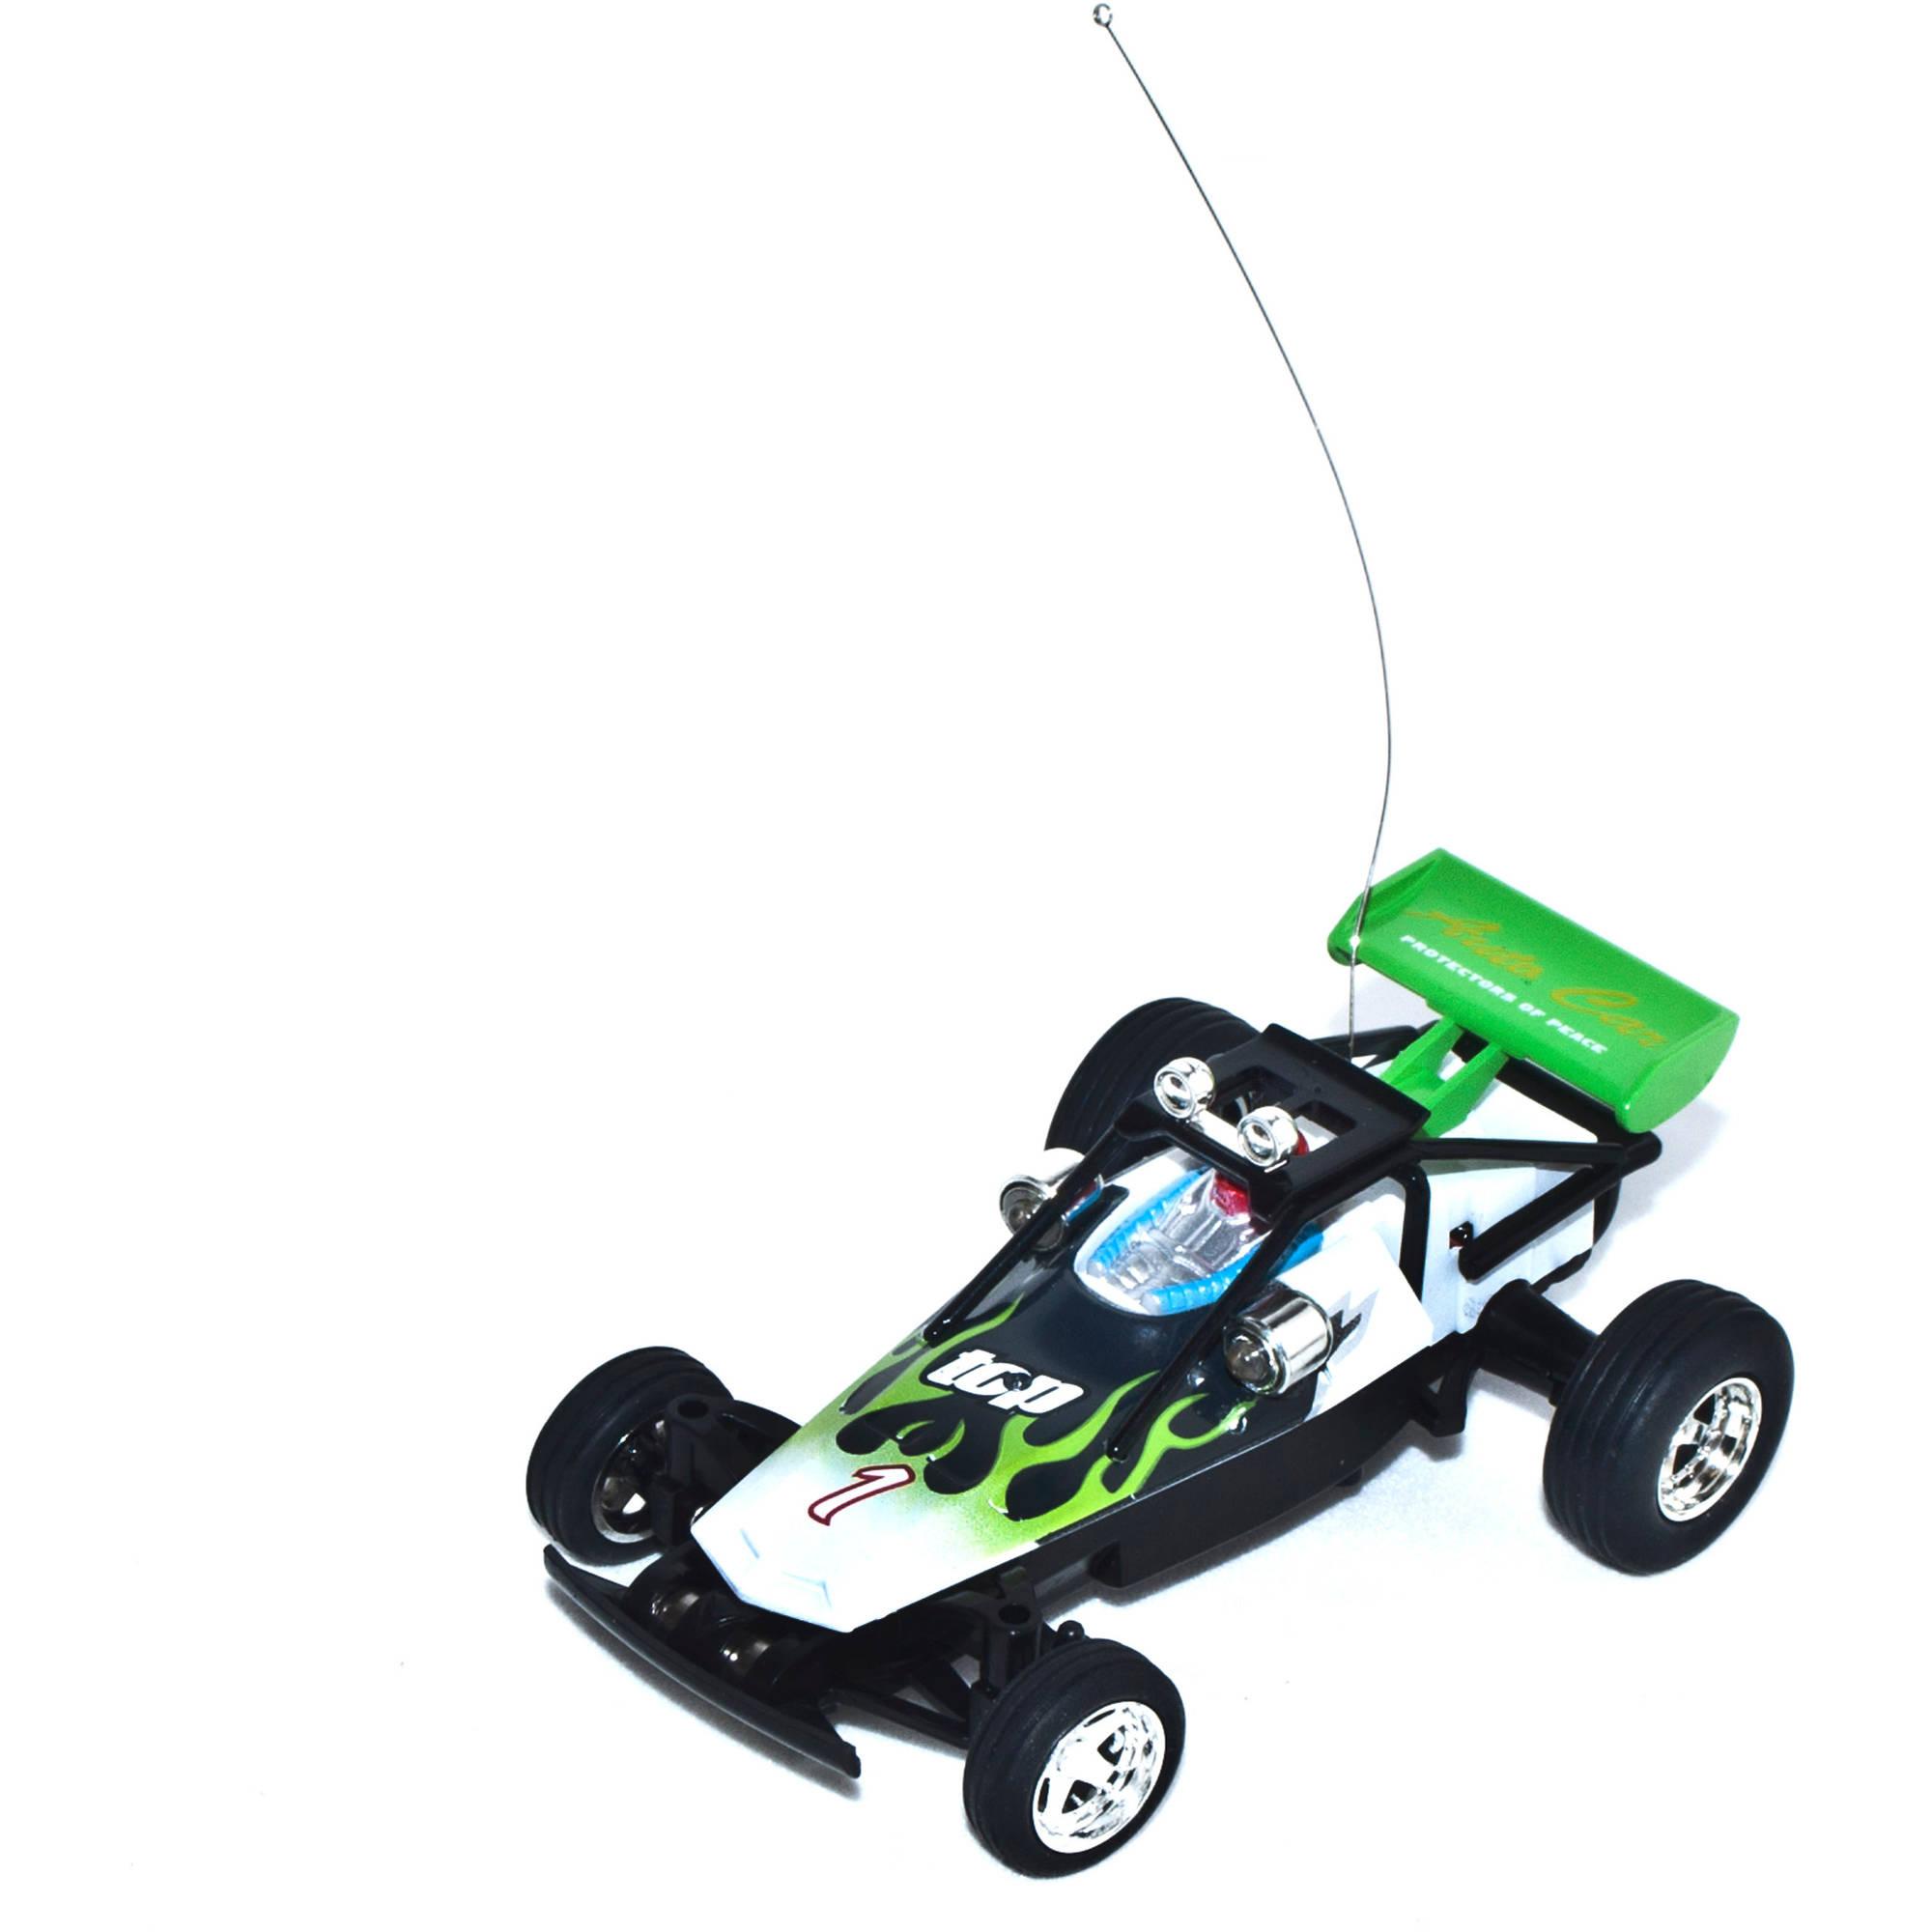 1:52 RCC912009CGREEN R/C Mini Buggy, Green